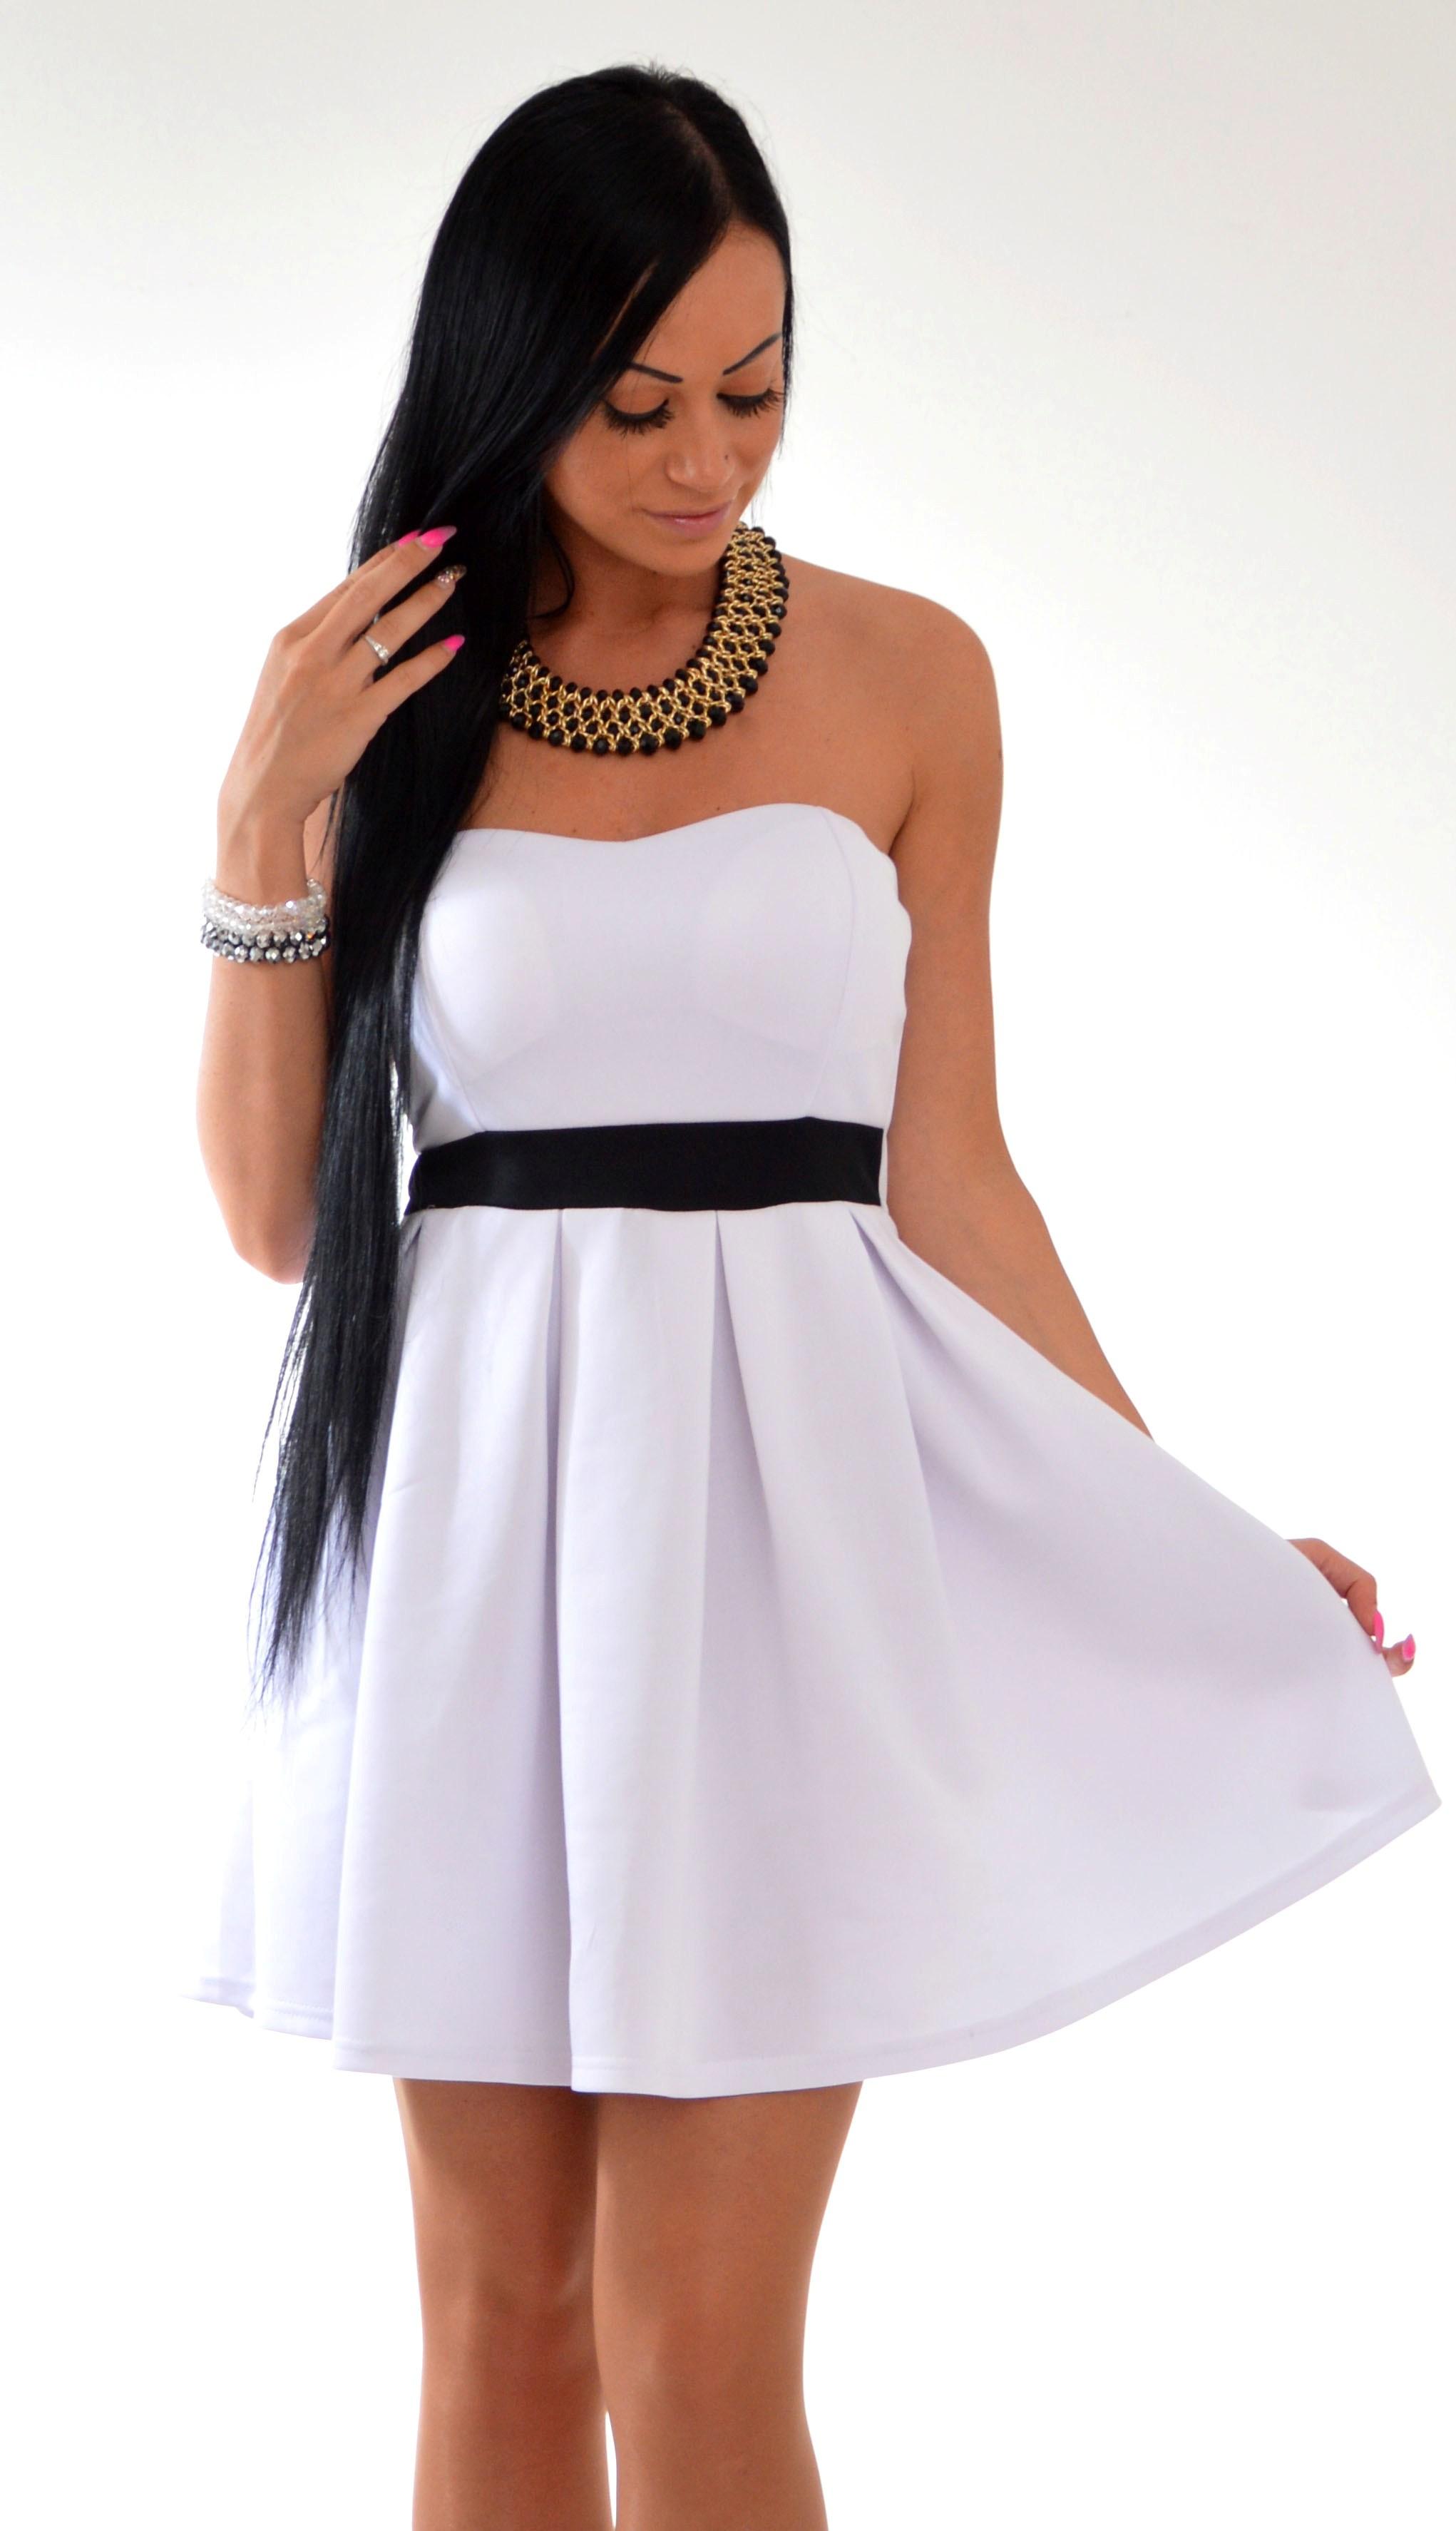 4716061f69a9 ružové šaty šaty modré šaty biele